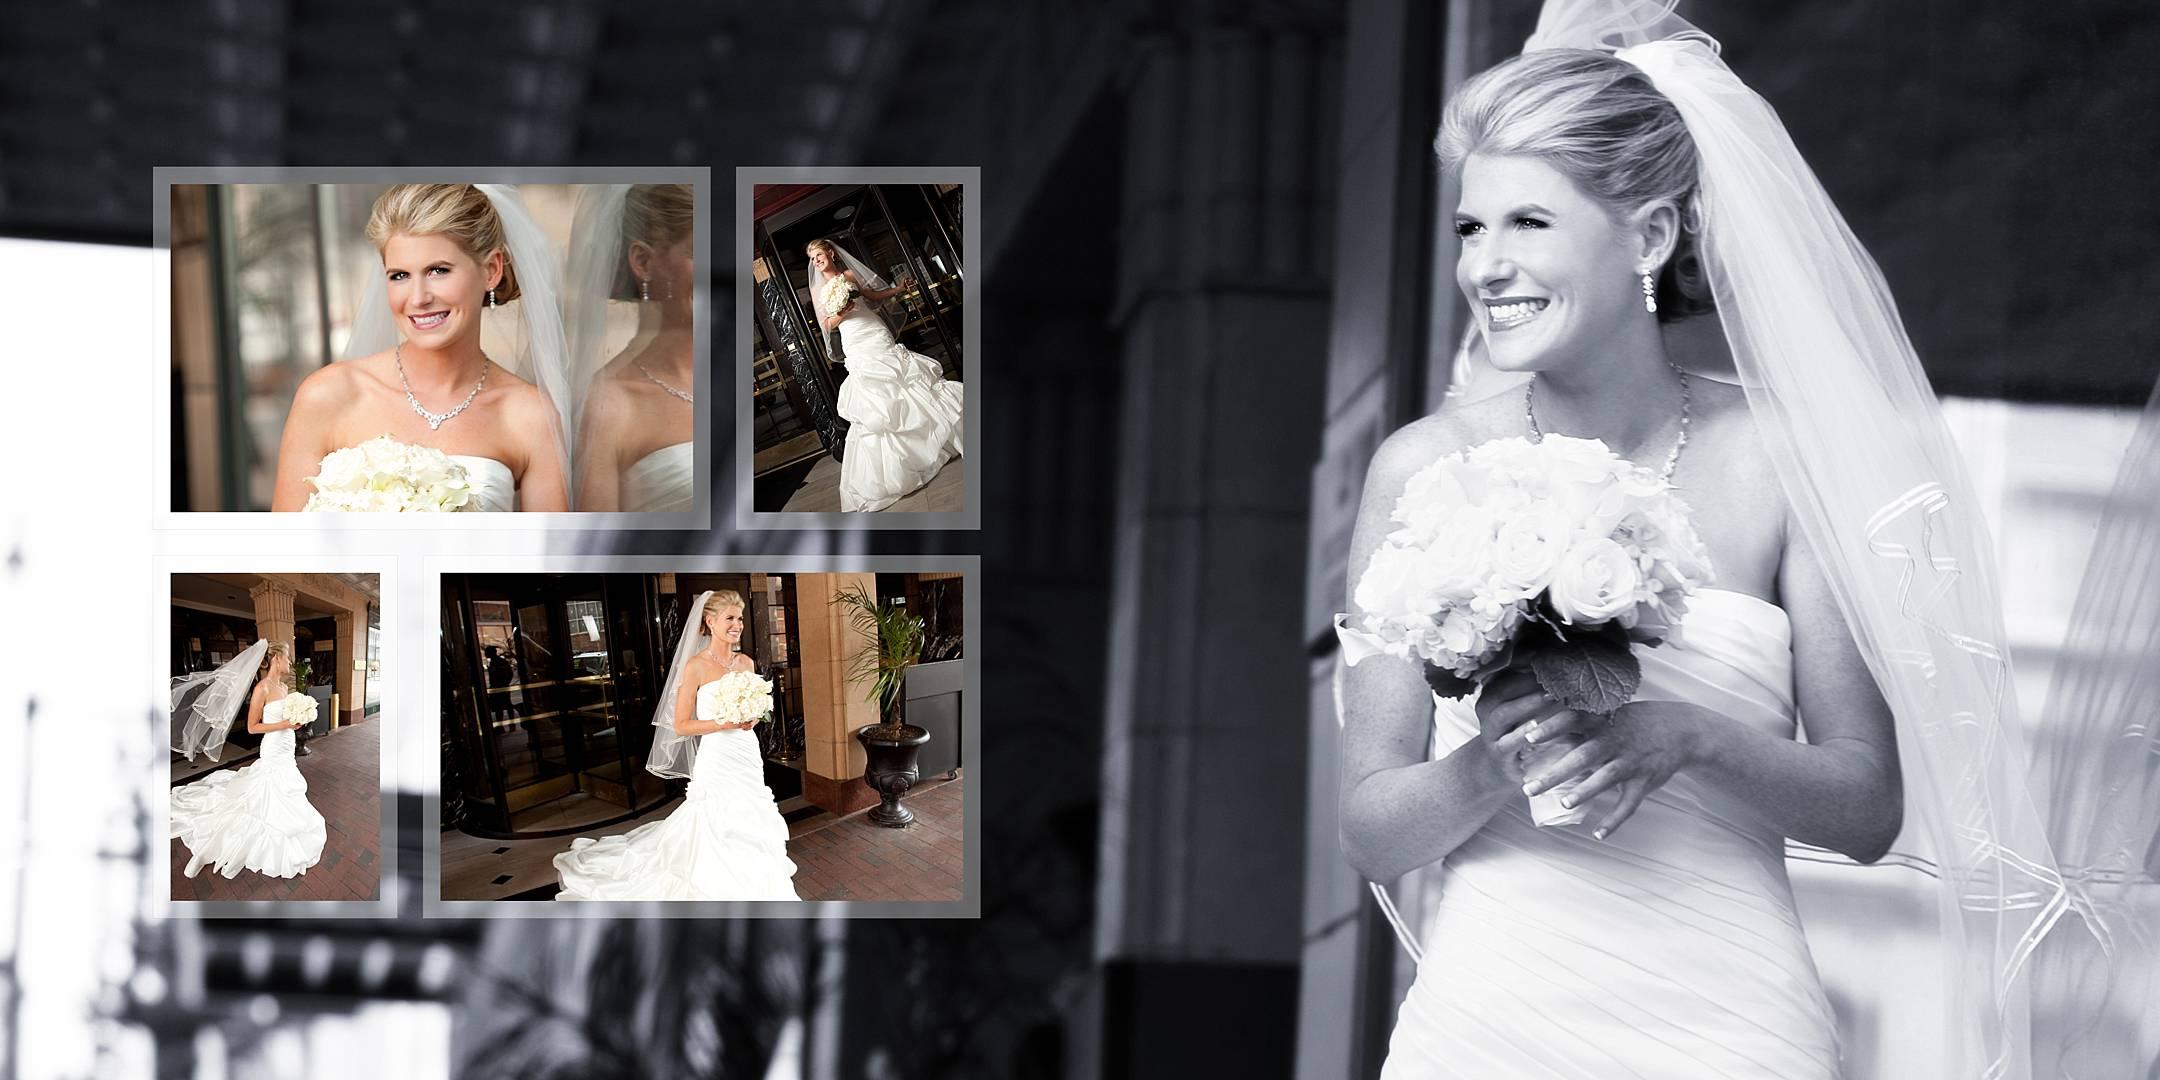 schmidt-photo-wedding-photography-chicago_2295